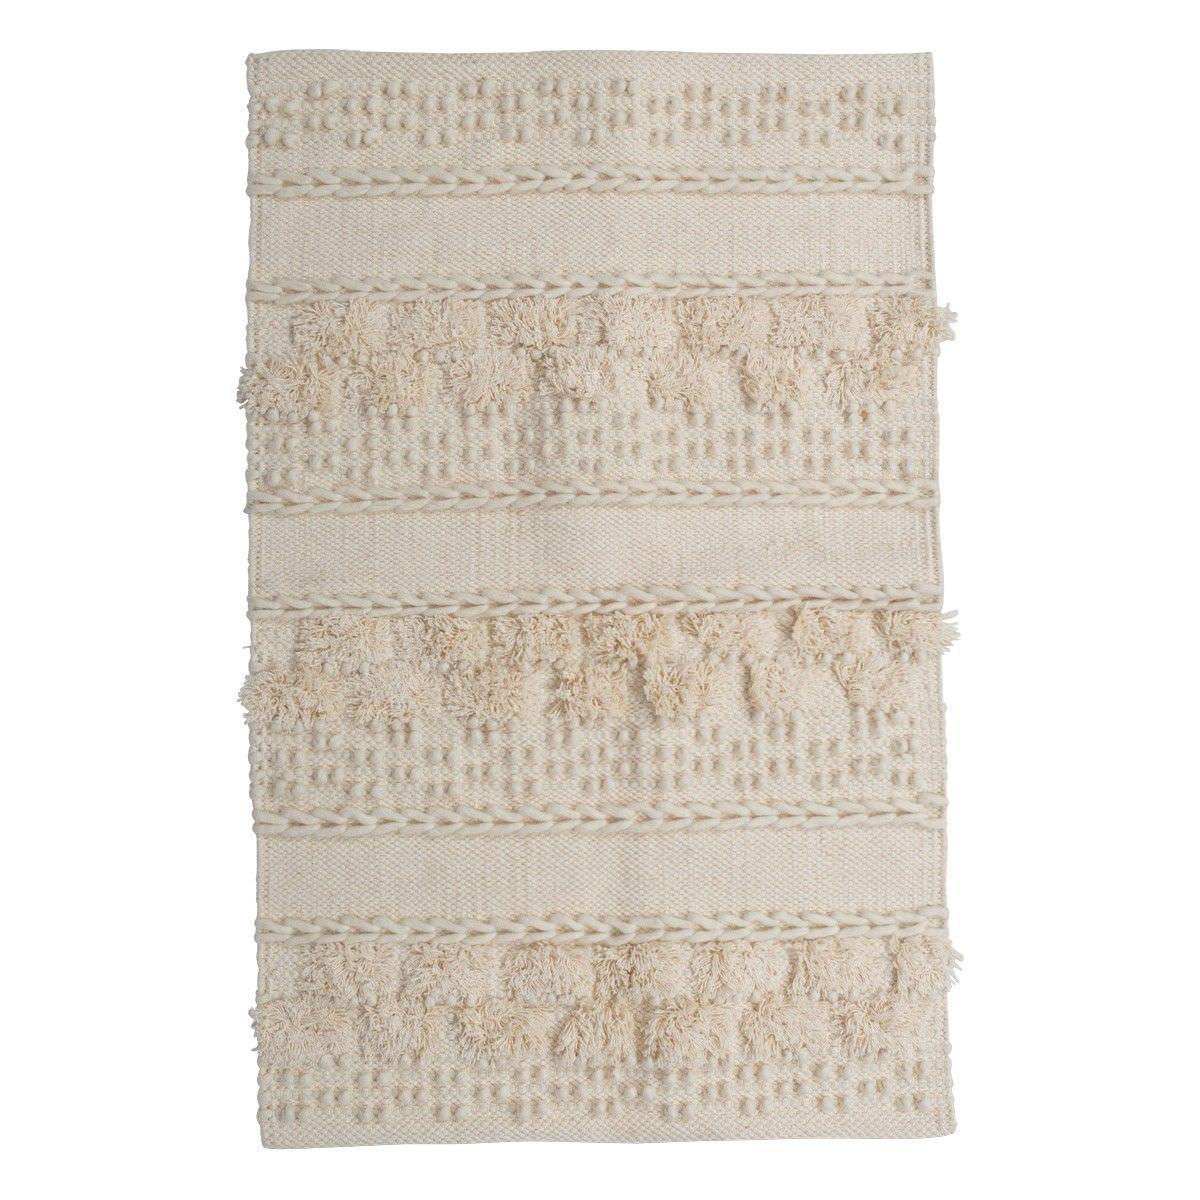 Hayman Cotton & Wool Rug, 90x60cm, Light Beige